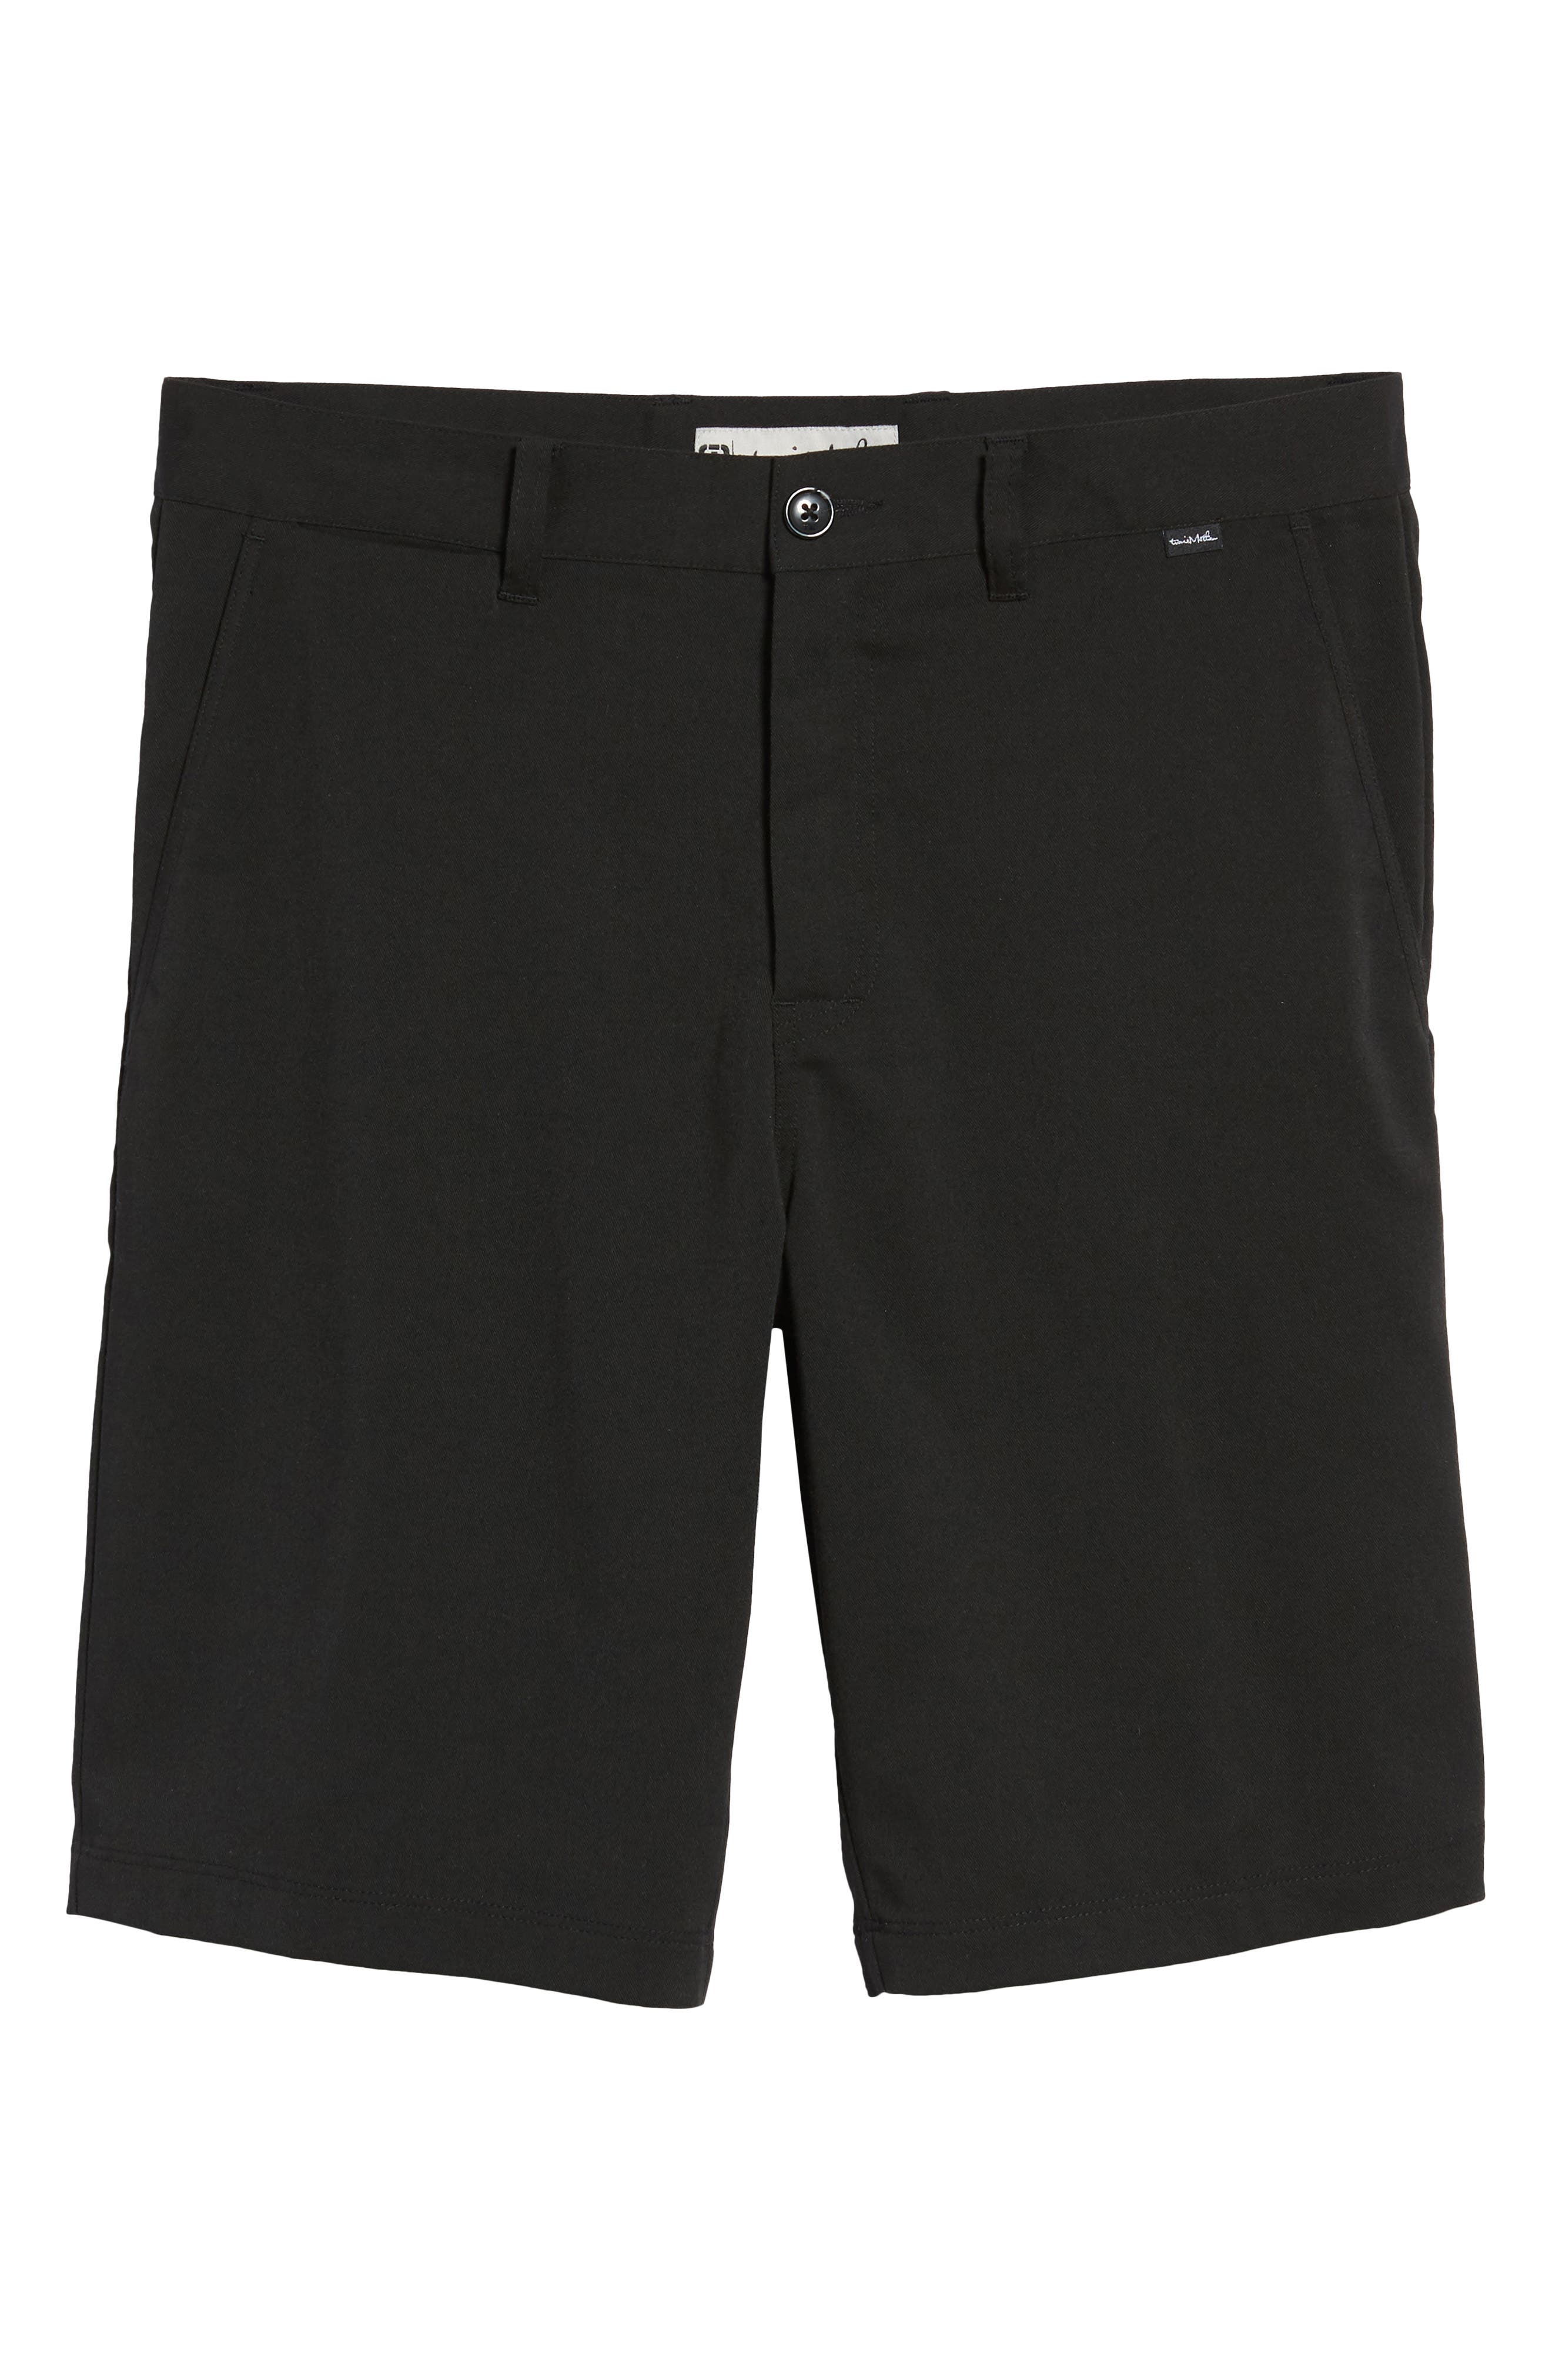 Puebla Stretch Shorts,                             Alternate thumbnail 6, color,                             Black